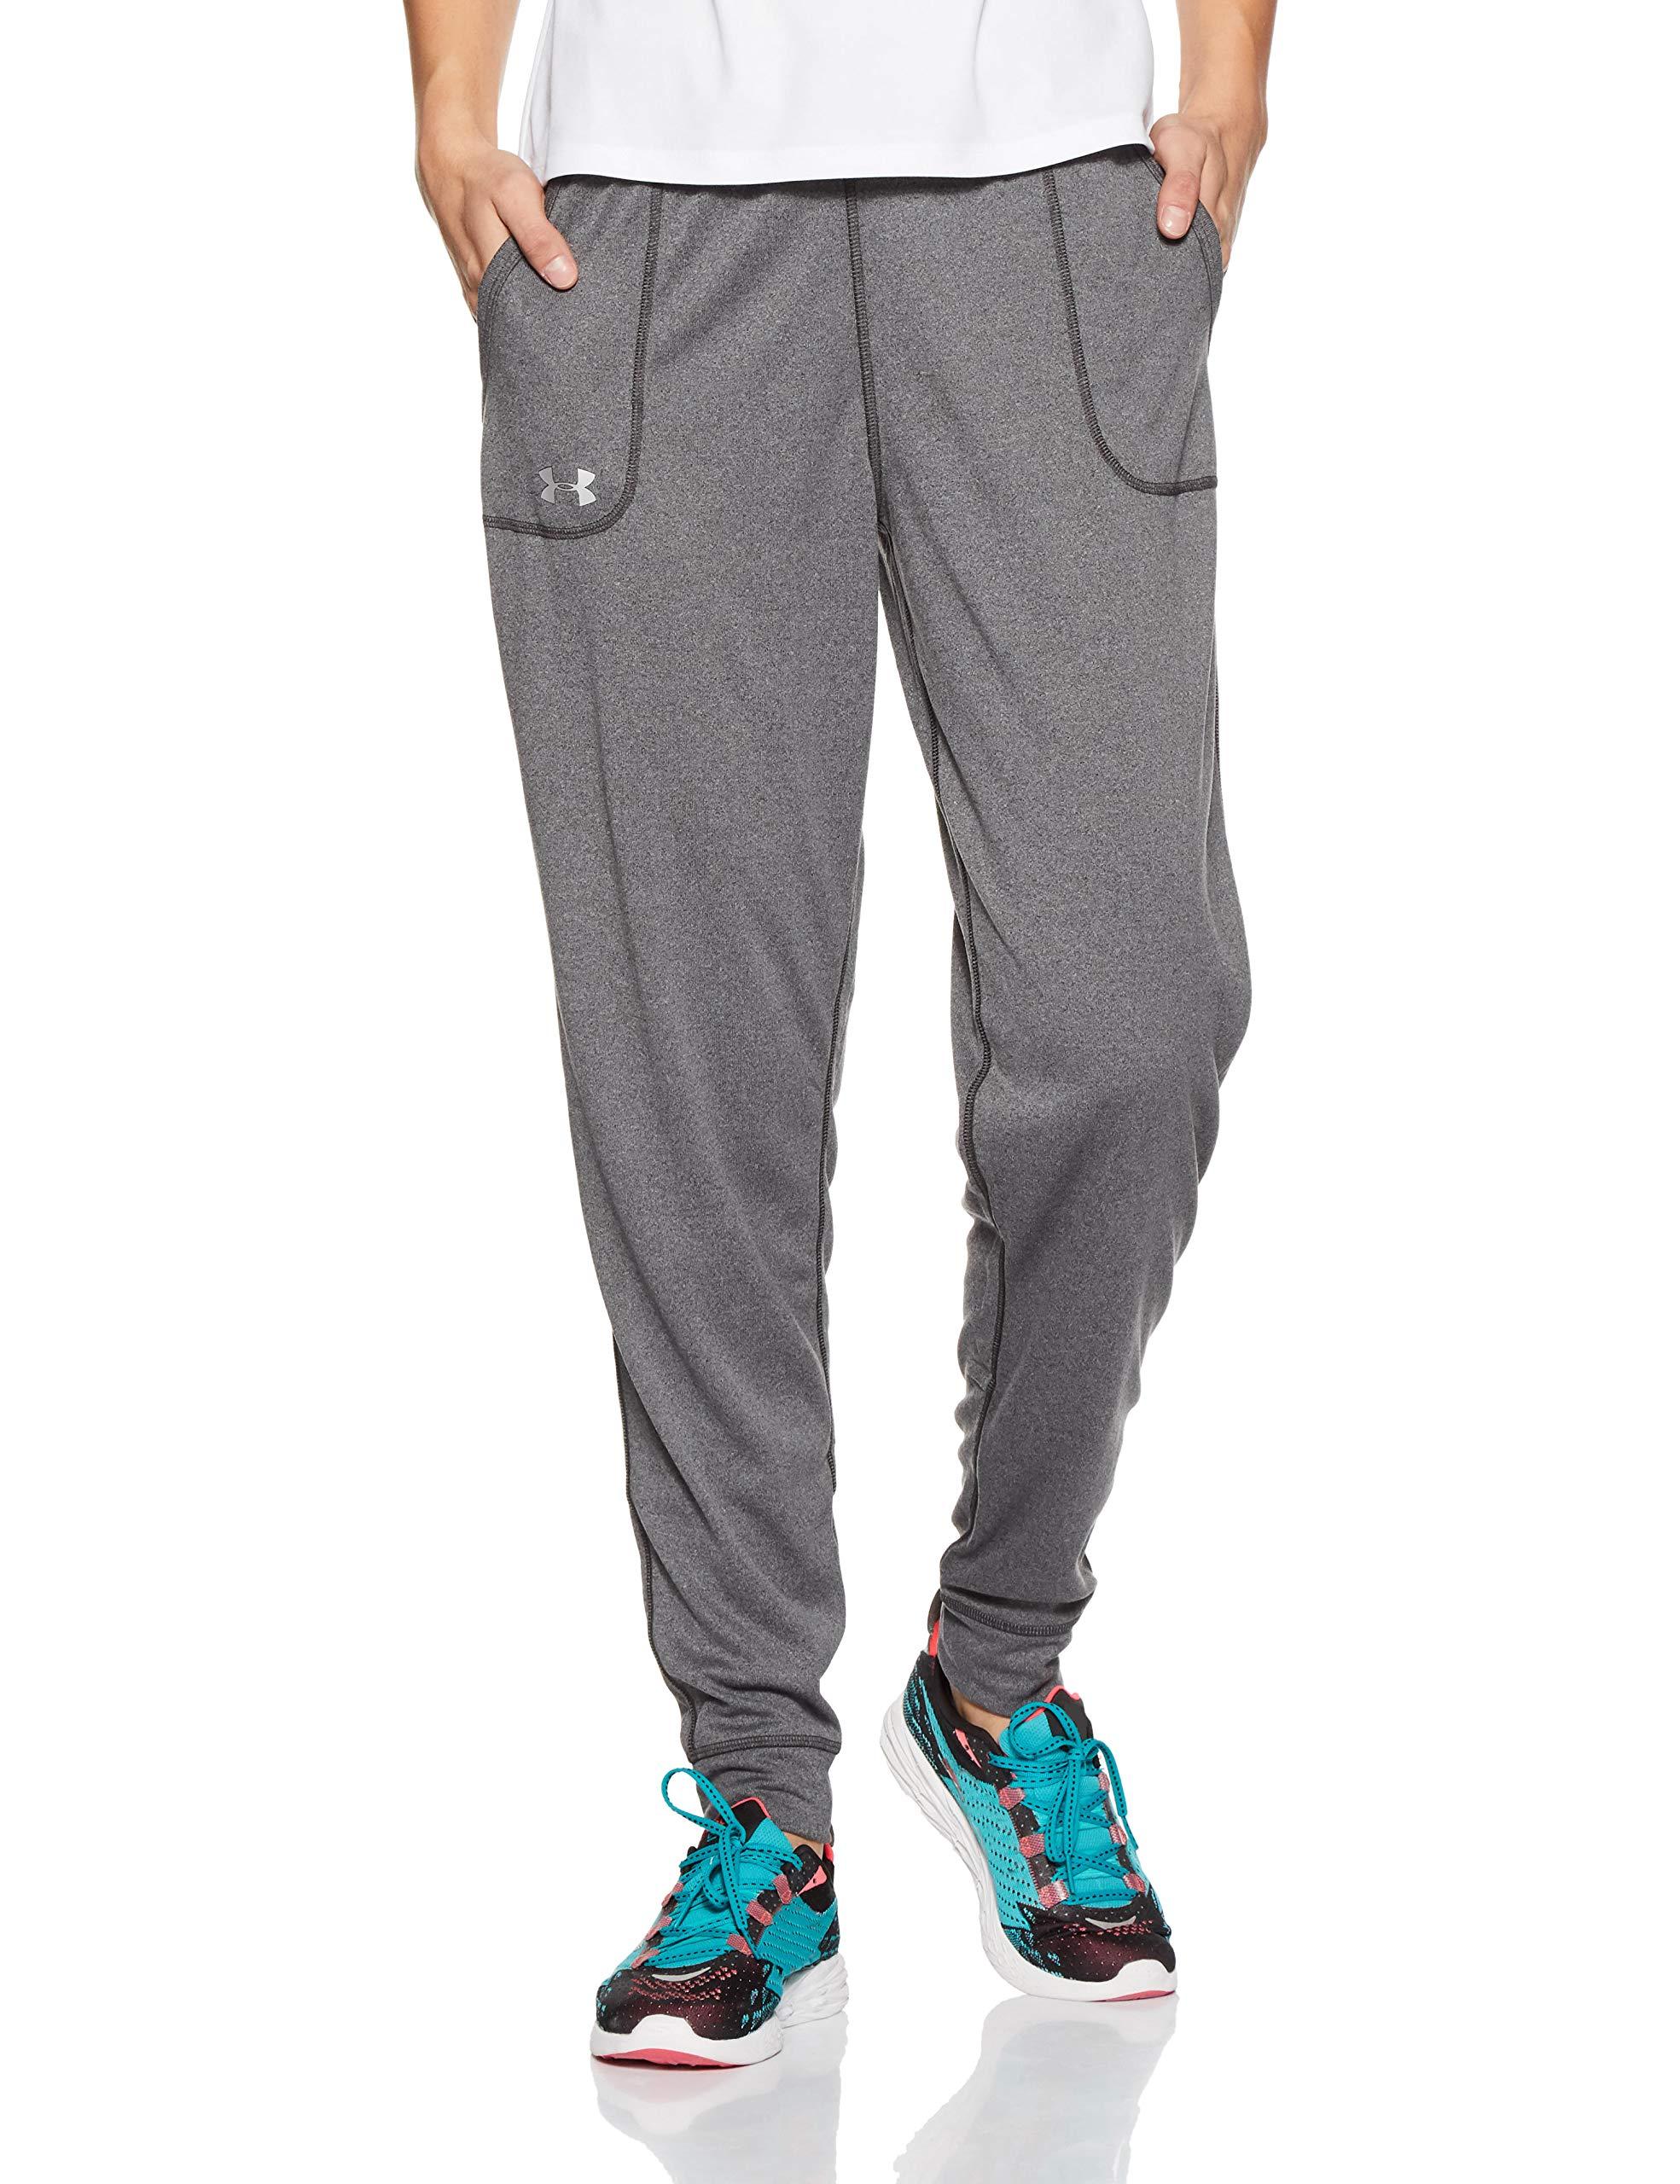 Dettagli su Under armour tech pant solid pantaloni sportivi donna grigio carbon (Kcj)